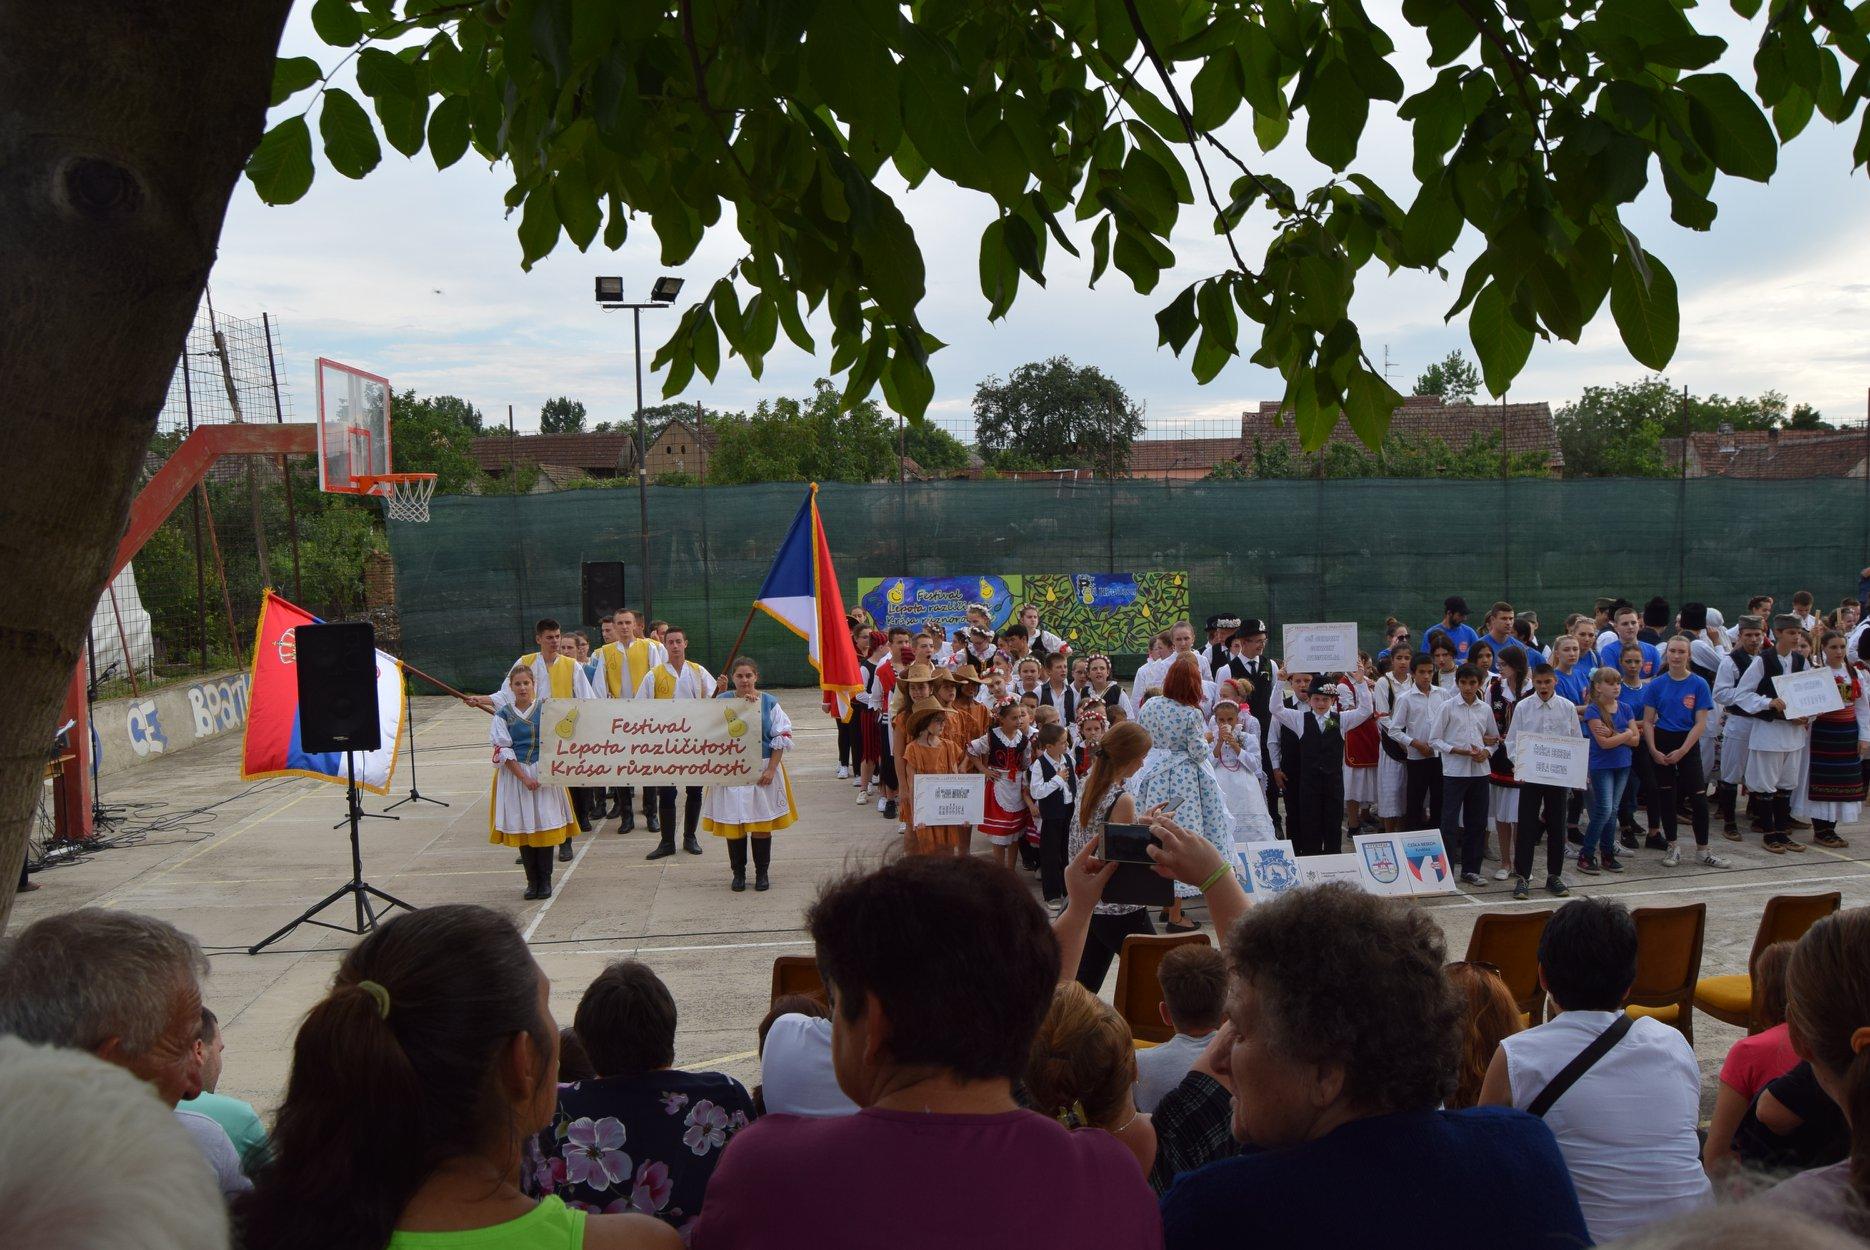 Festival-Lepota-Razlicitosti-2018-naslovna